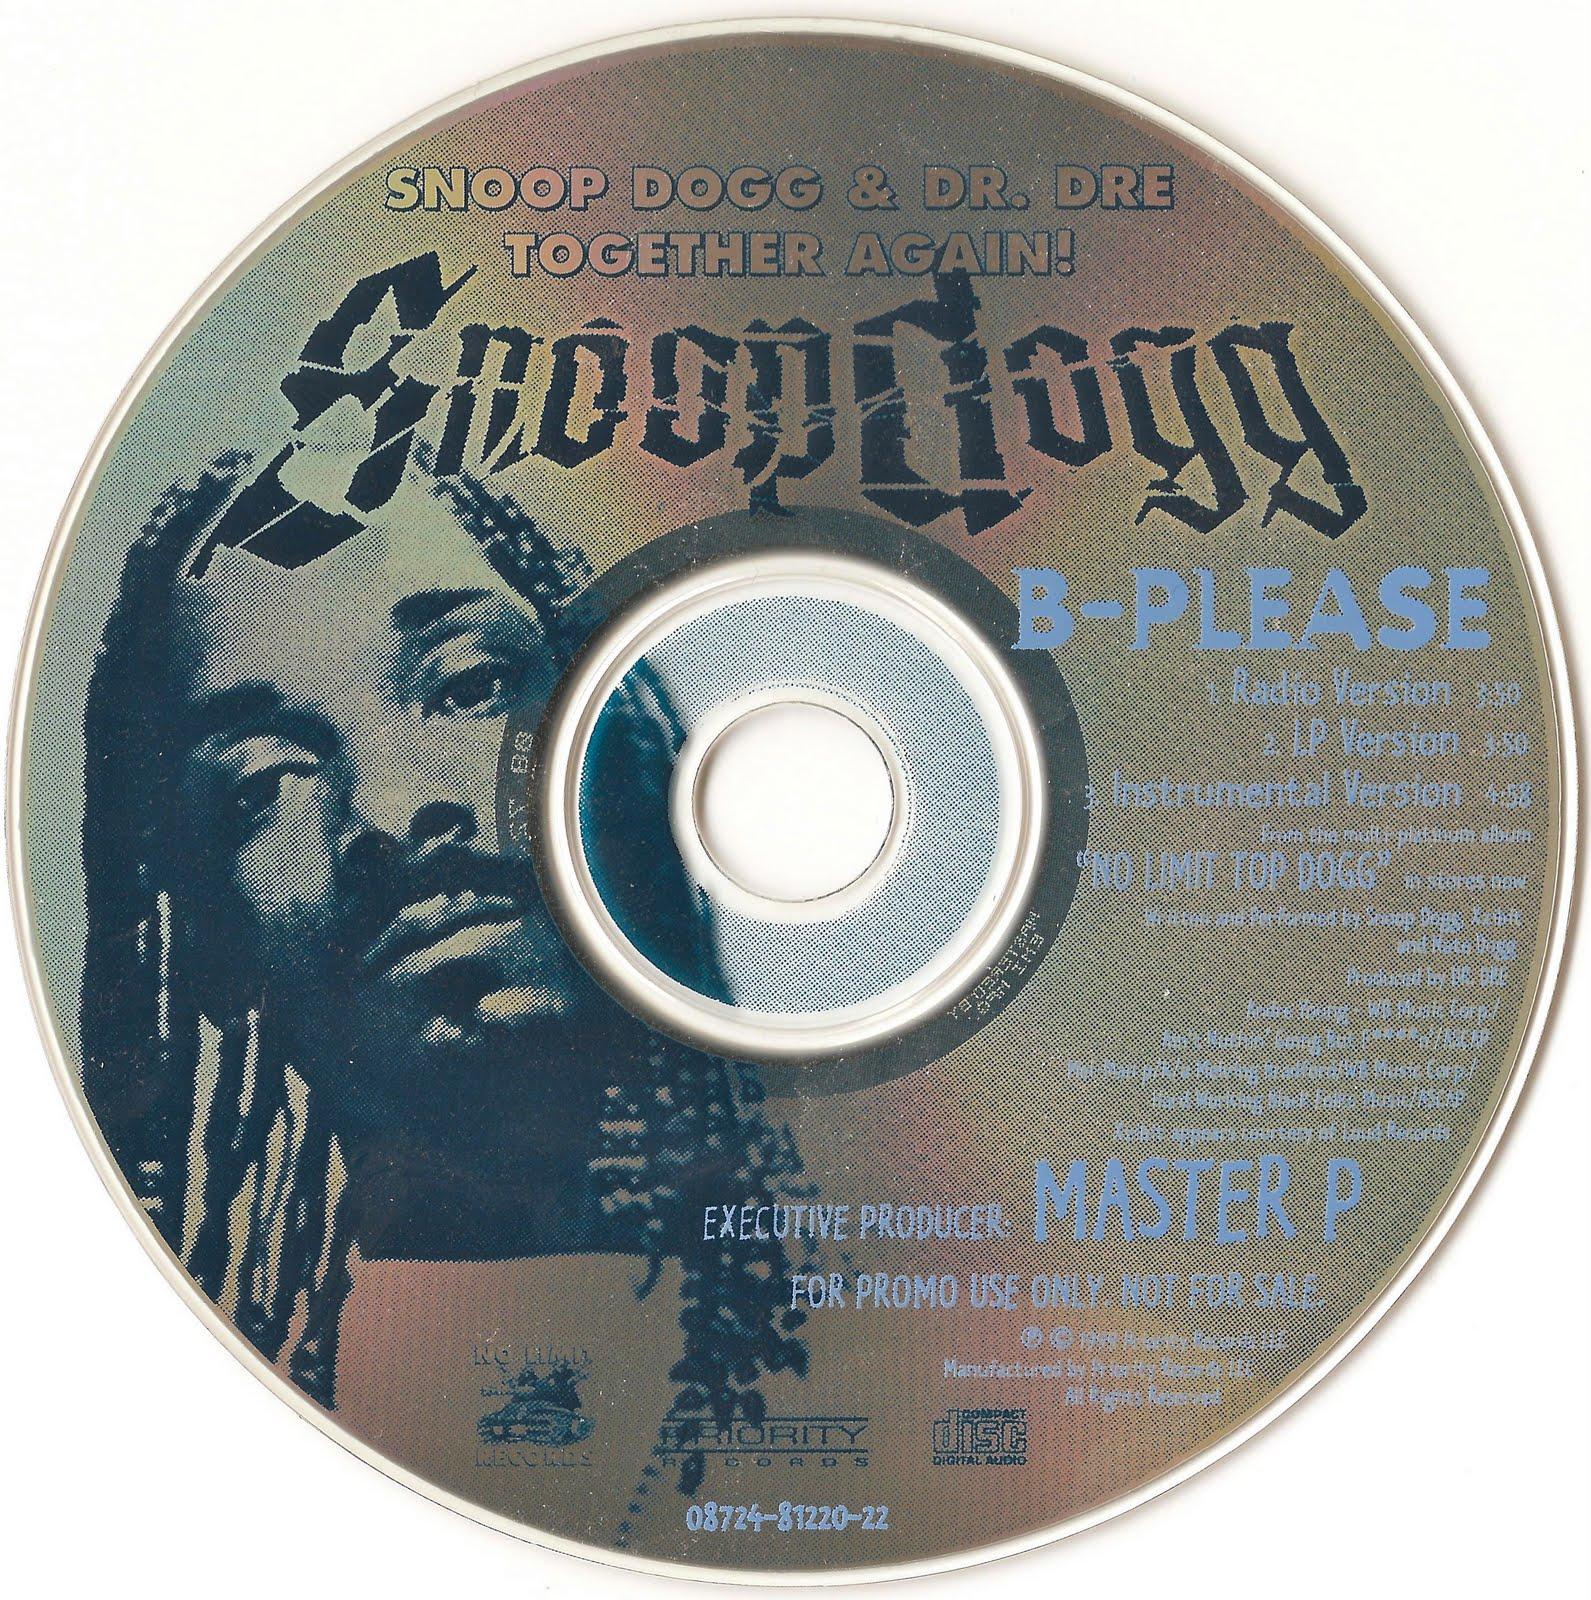 http://4.bp.blogspot.com/-WJ2apI8o6oA/Th-paTOb0wI/AAAAAAAAB2M/PbzluKE02g8/s1600/SnoopDoggB+CDD.jpg